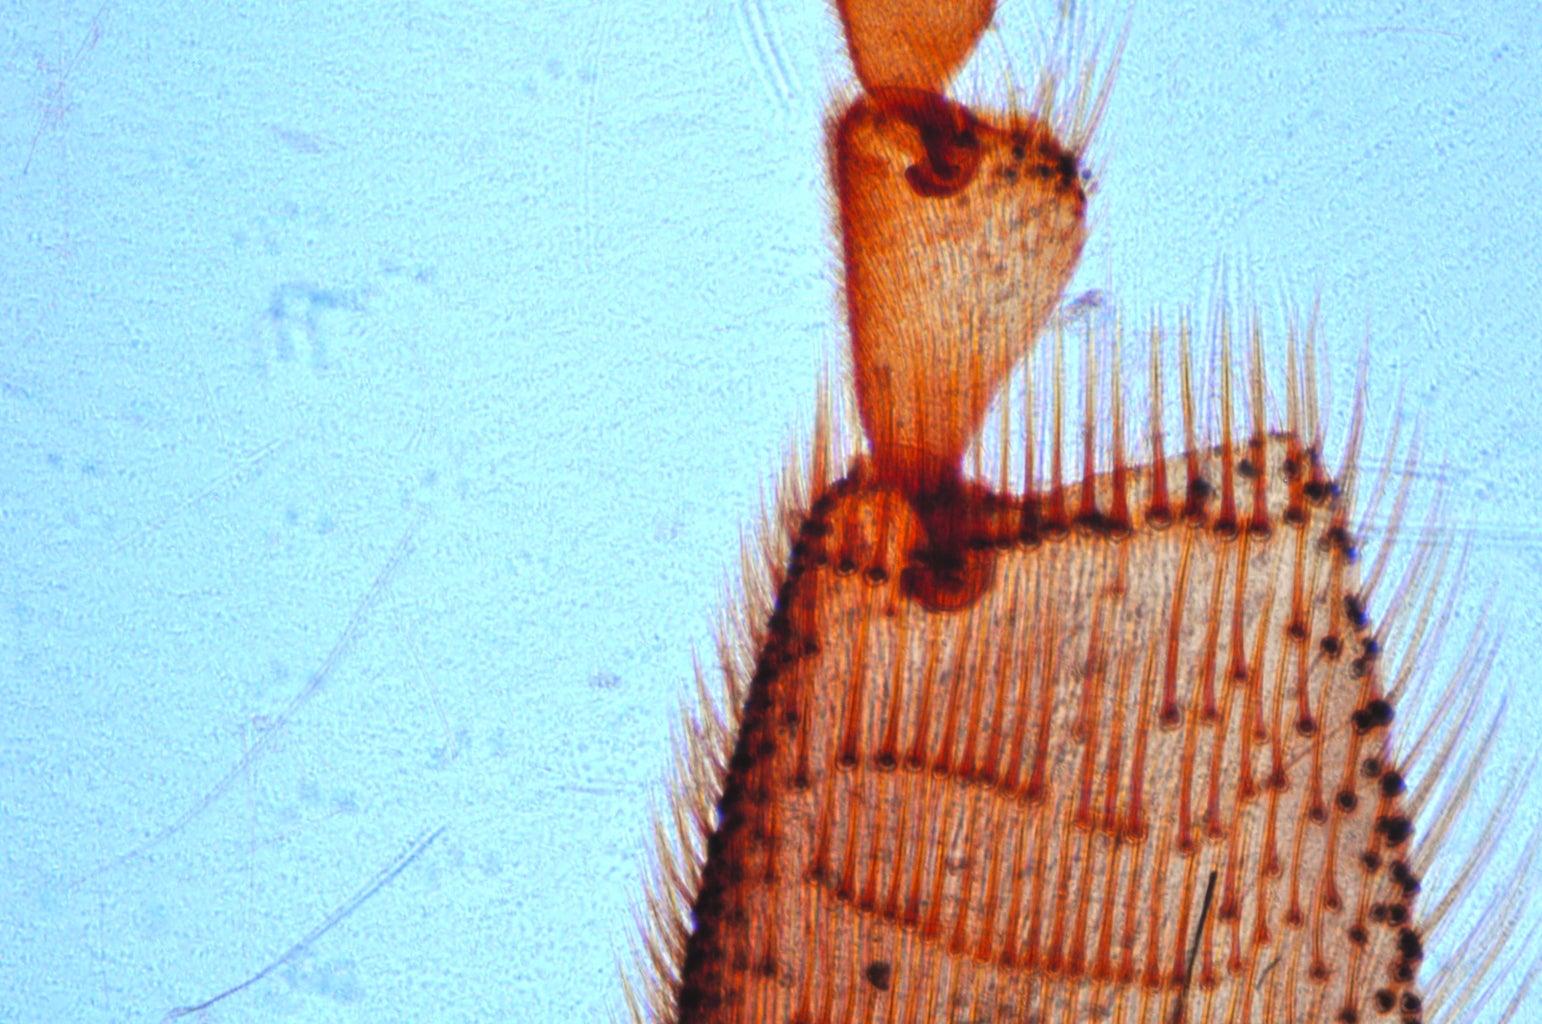 Low-cost Fluorescence and Brightfield Microscopes